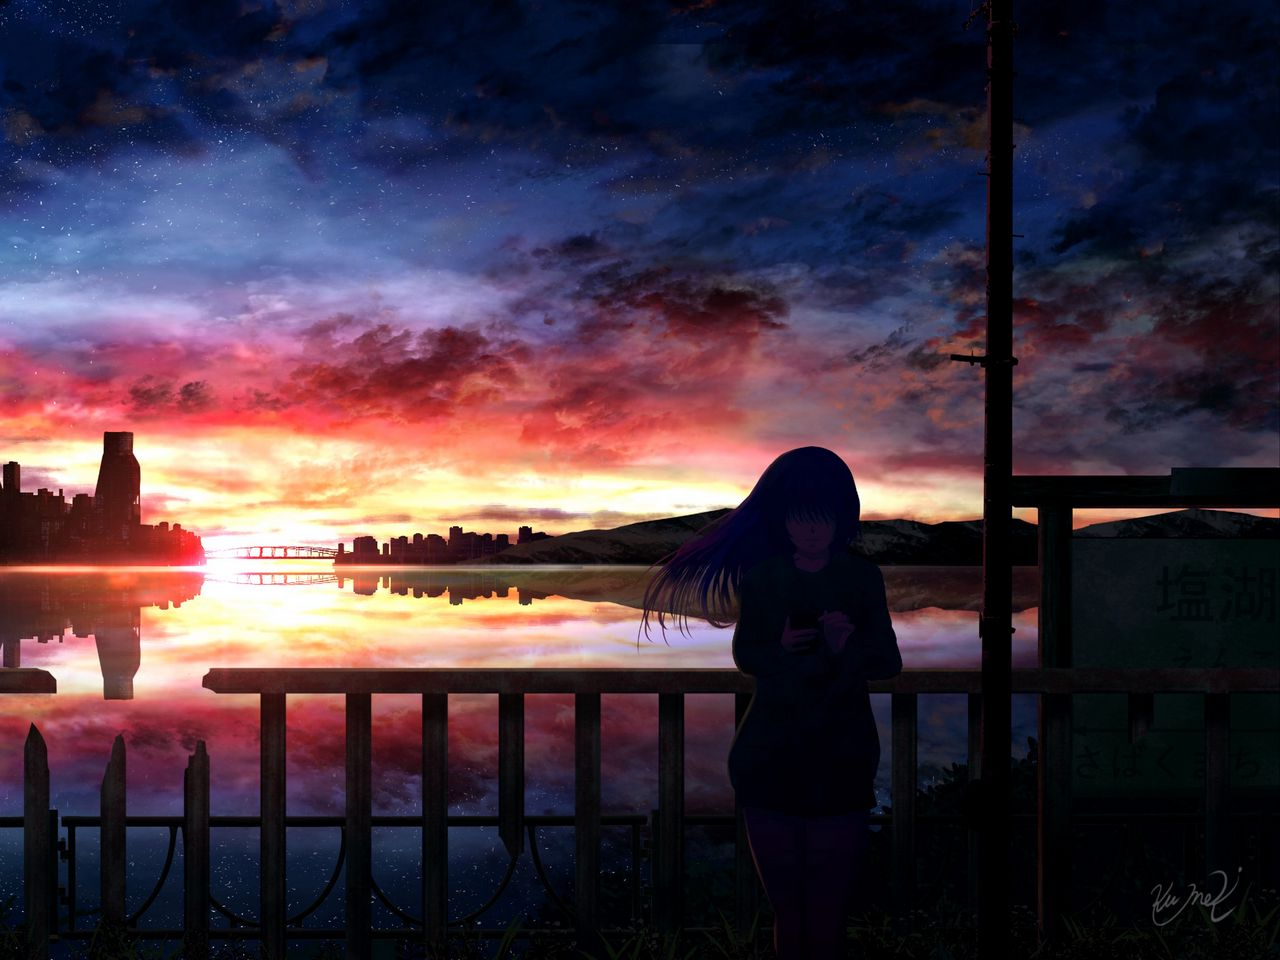 1280x960 Wallpaper silhouette, night, starry sky, girl, anime